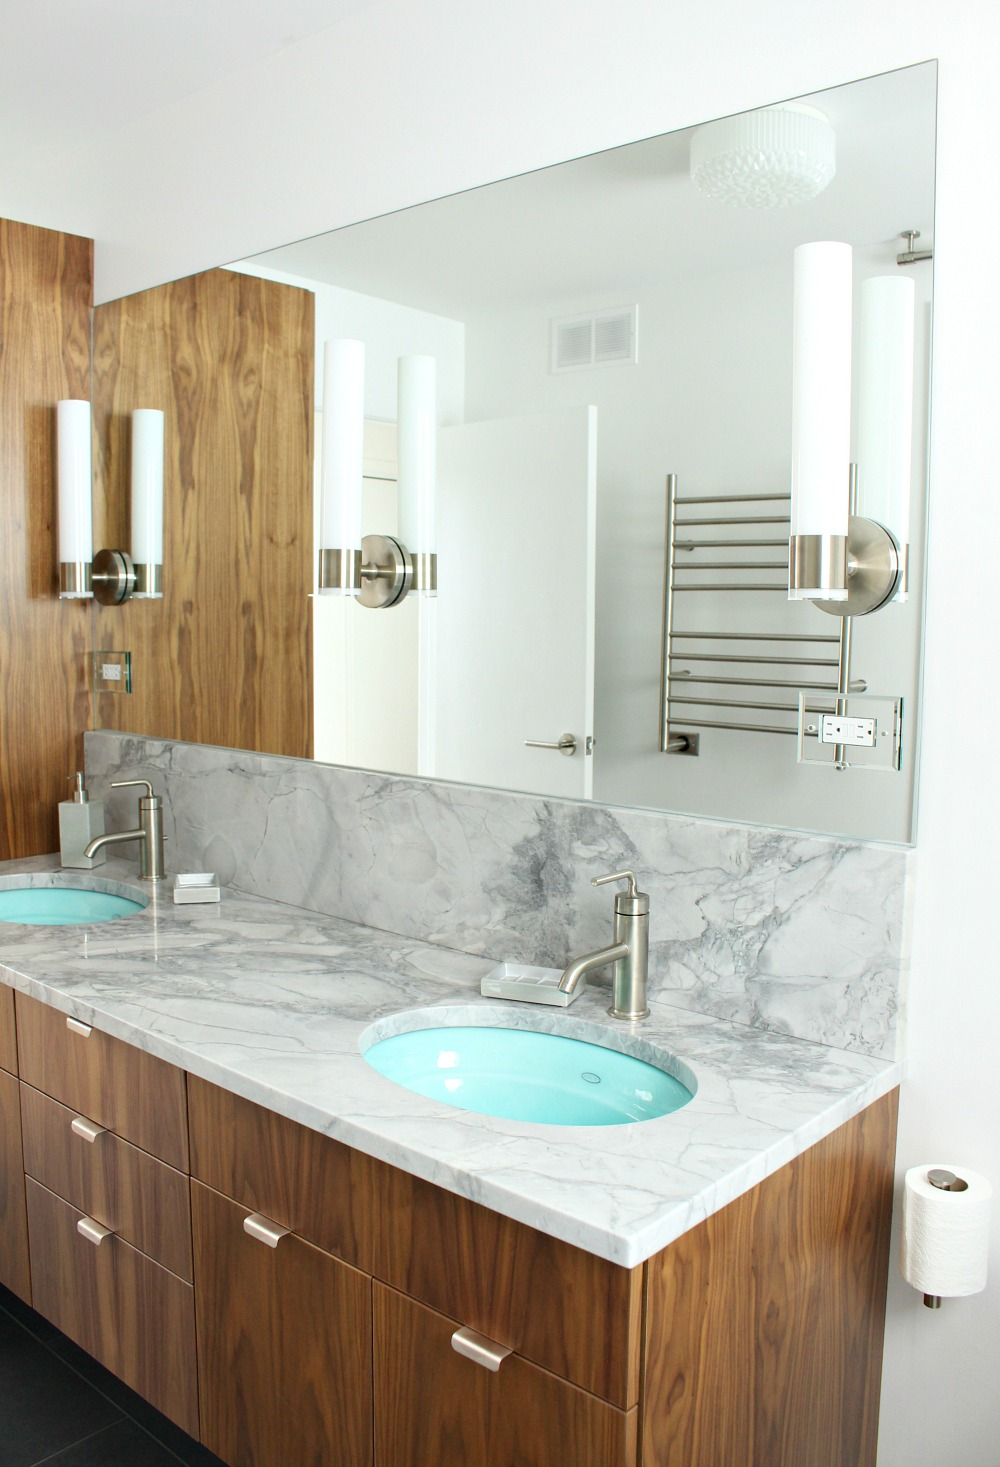 How to Design a Bathroom You Love | Dans le Lakehouse